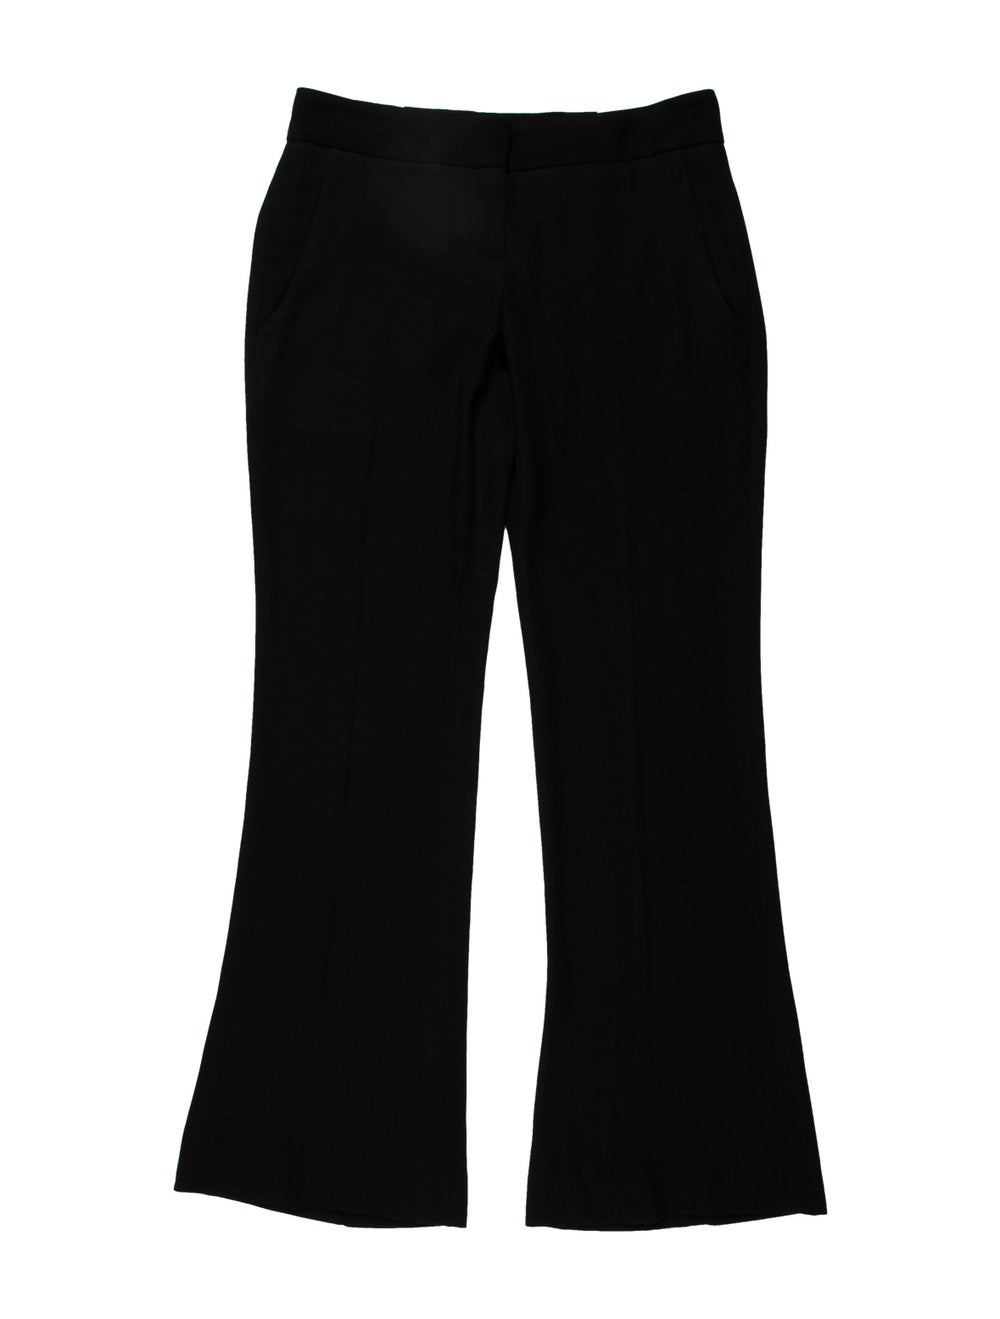 Theory Wide Leg Pants Black - image 1